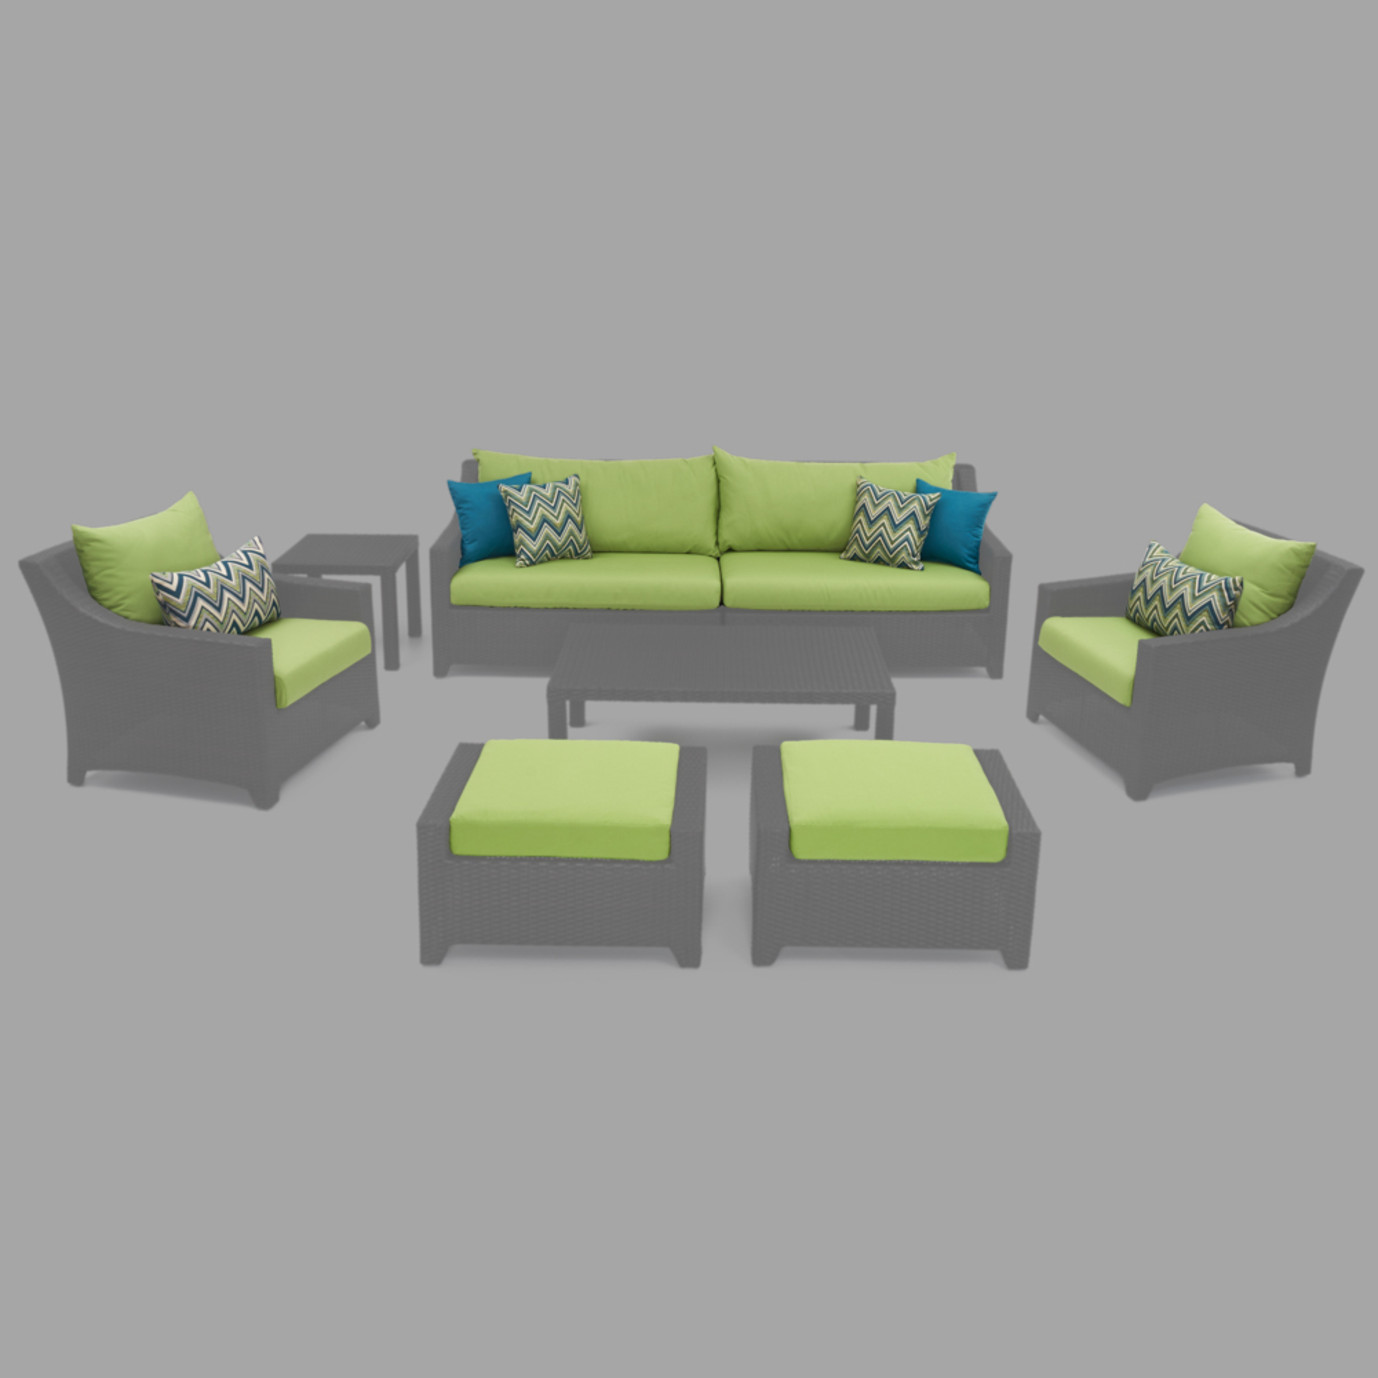 Modular Outdoor 8pc Club Cushion Cover Set - Gingko Green